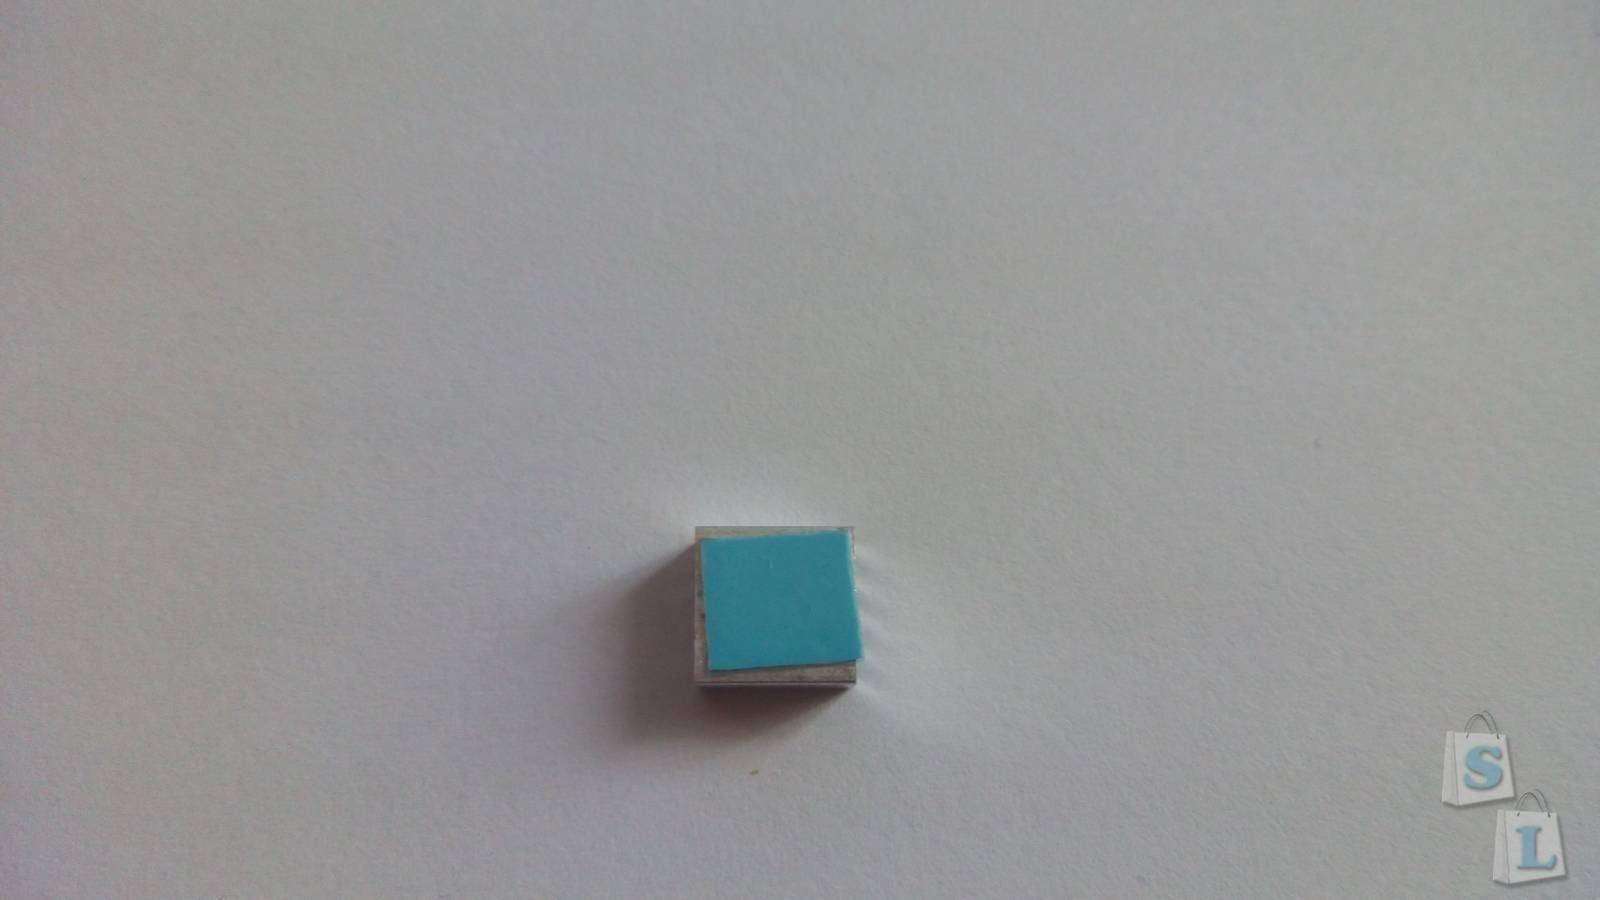 Aliexpress: Китайский комплект электроники для 3D-принтера (Arduino Mega 2560 R3+RAMPS 1.4 + 5xA4988 stepper motor drivers)